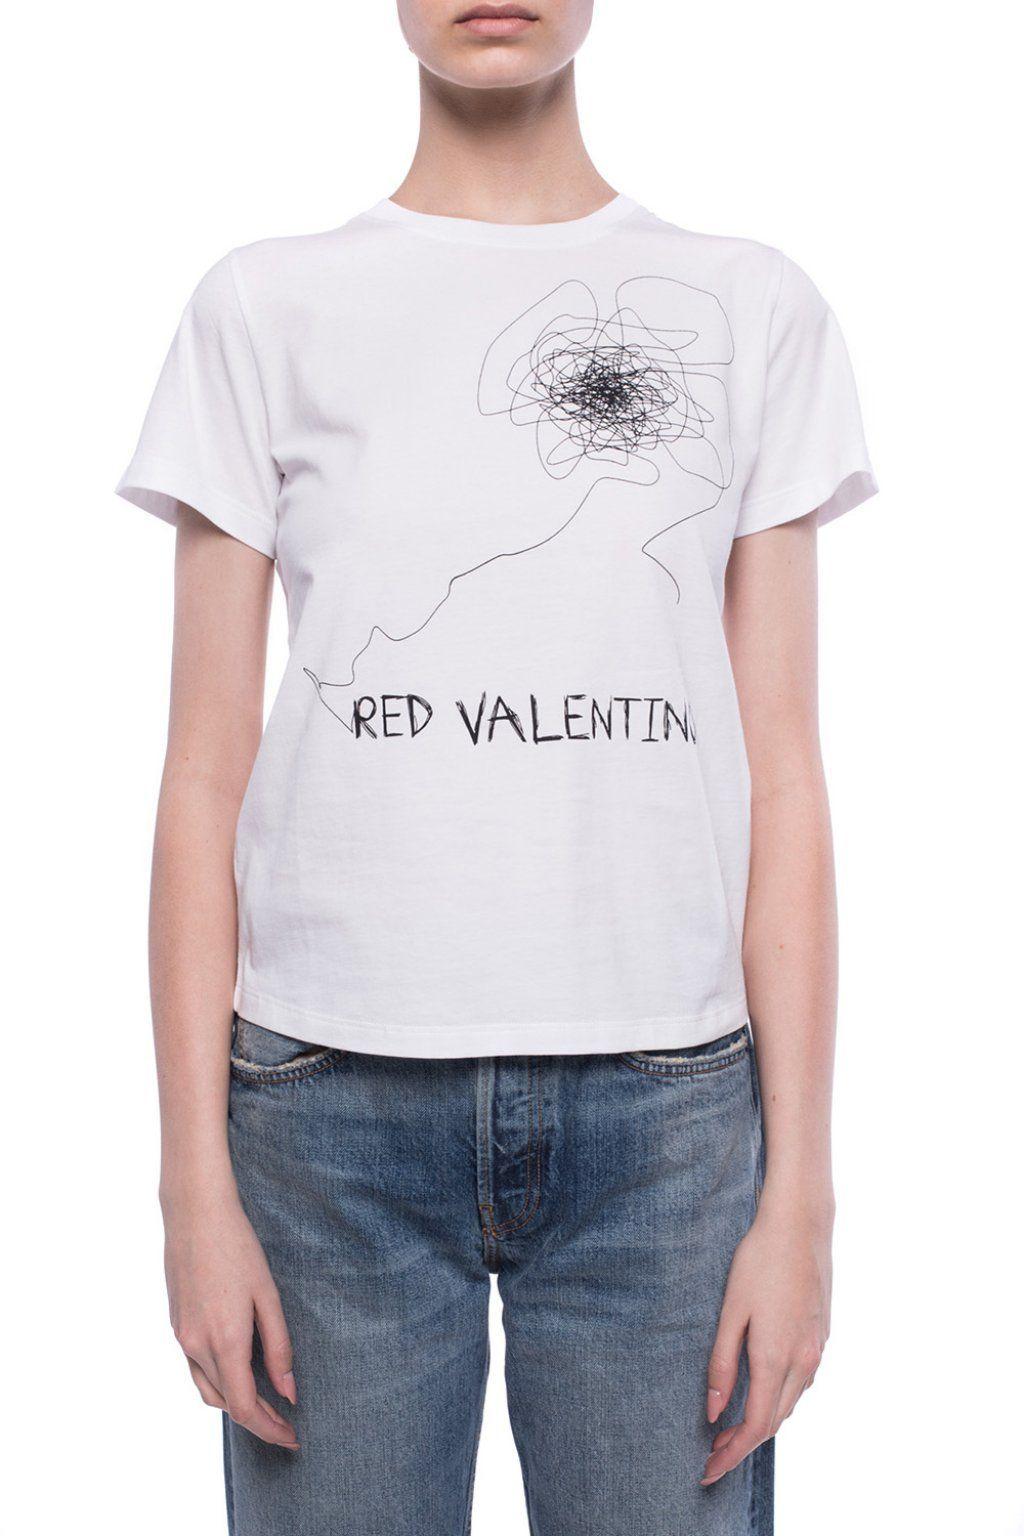 RED VALENTINO WOMEN'S TR0MG05A5510BO WHITE COTTON T-SHIRT